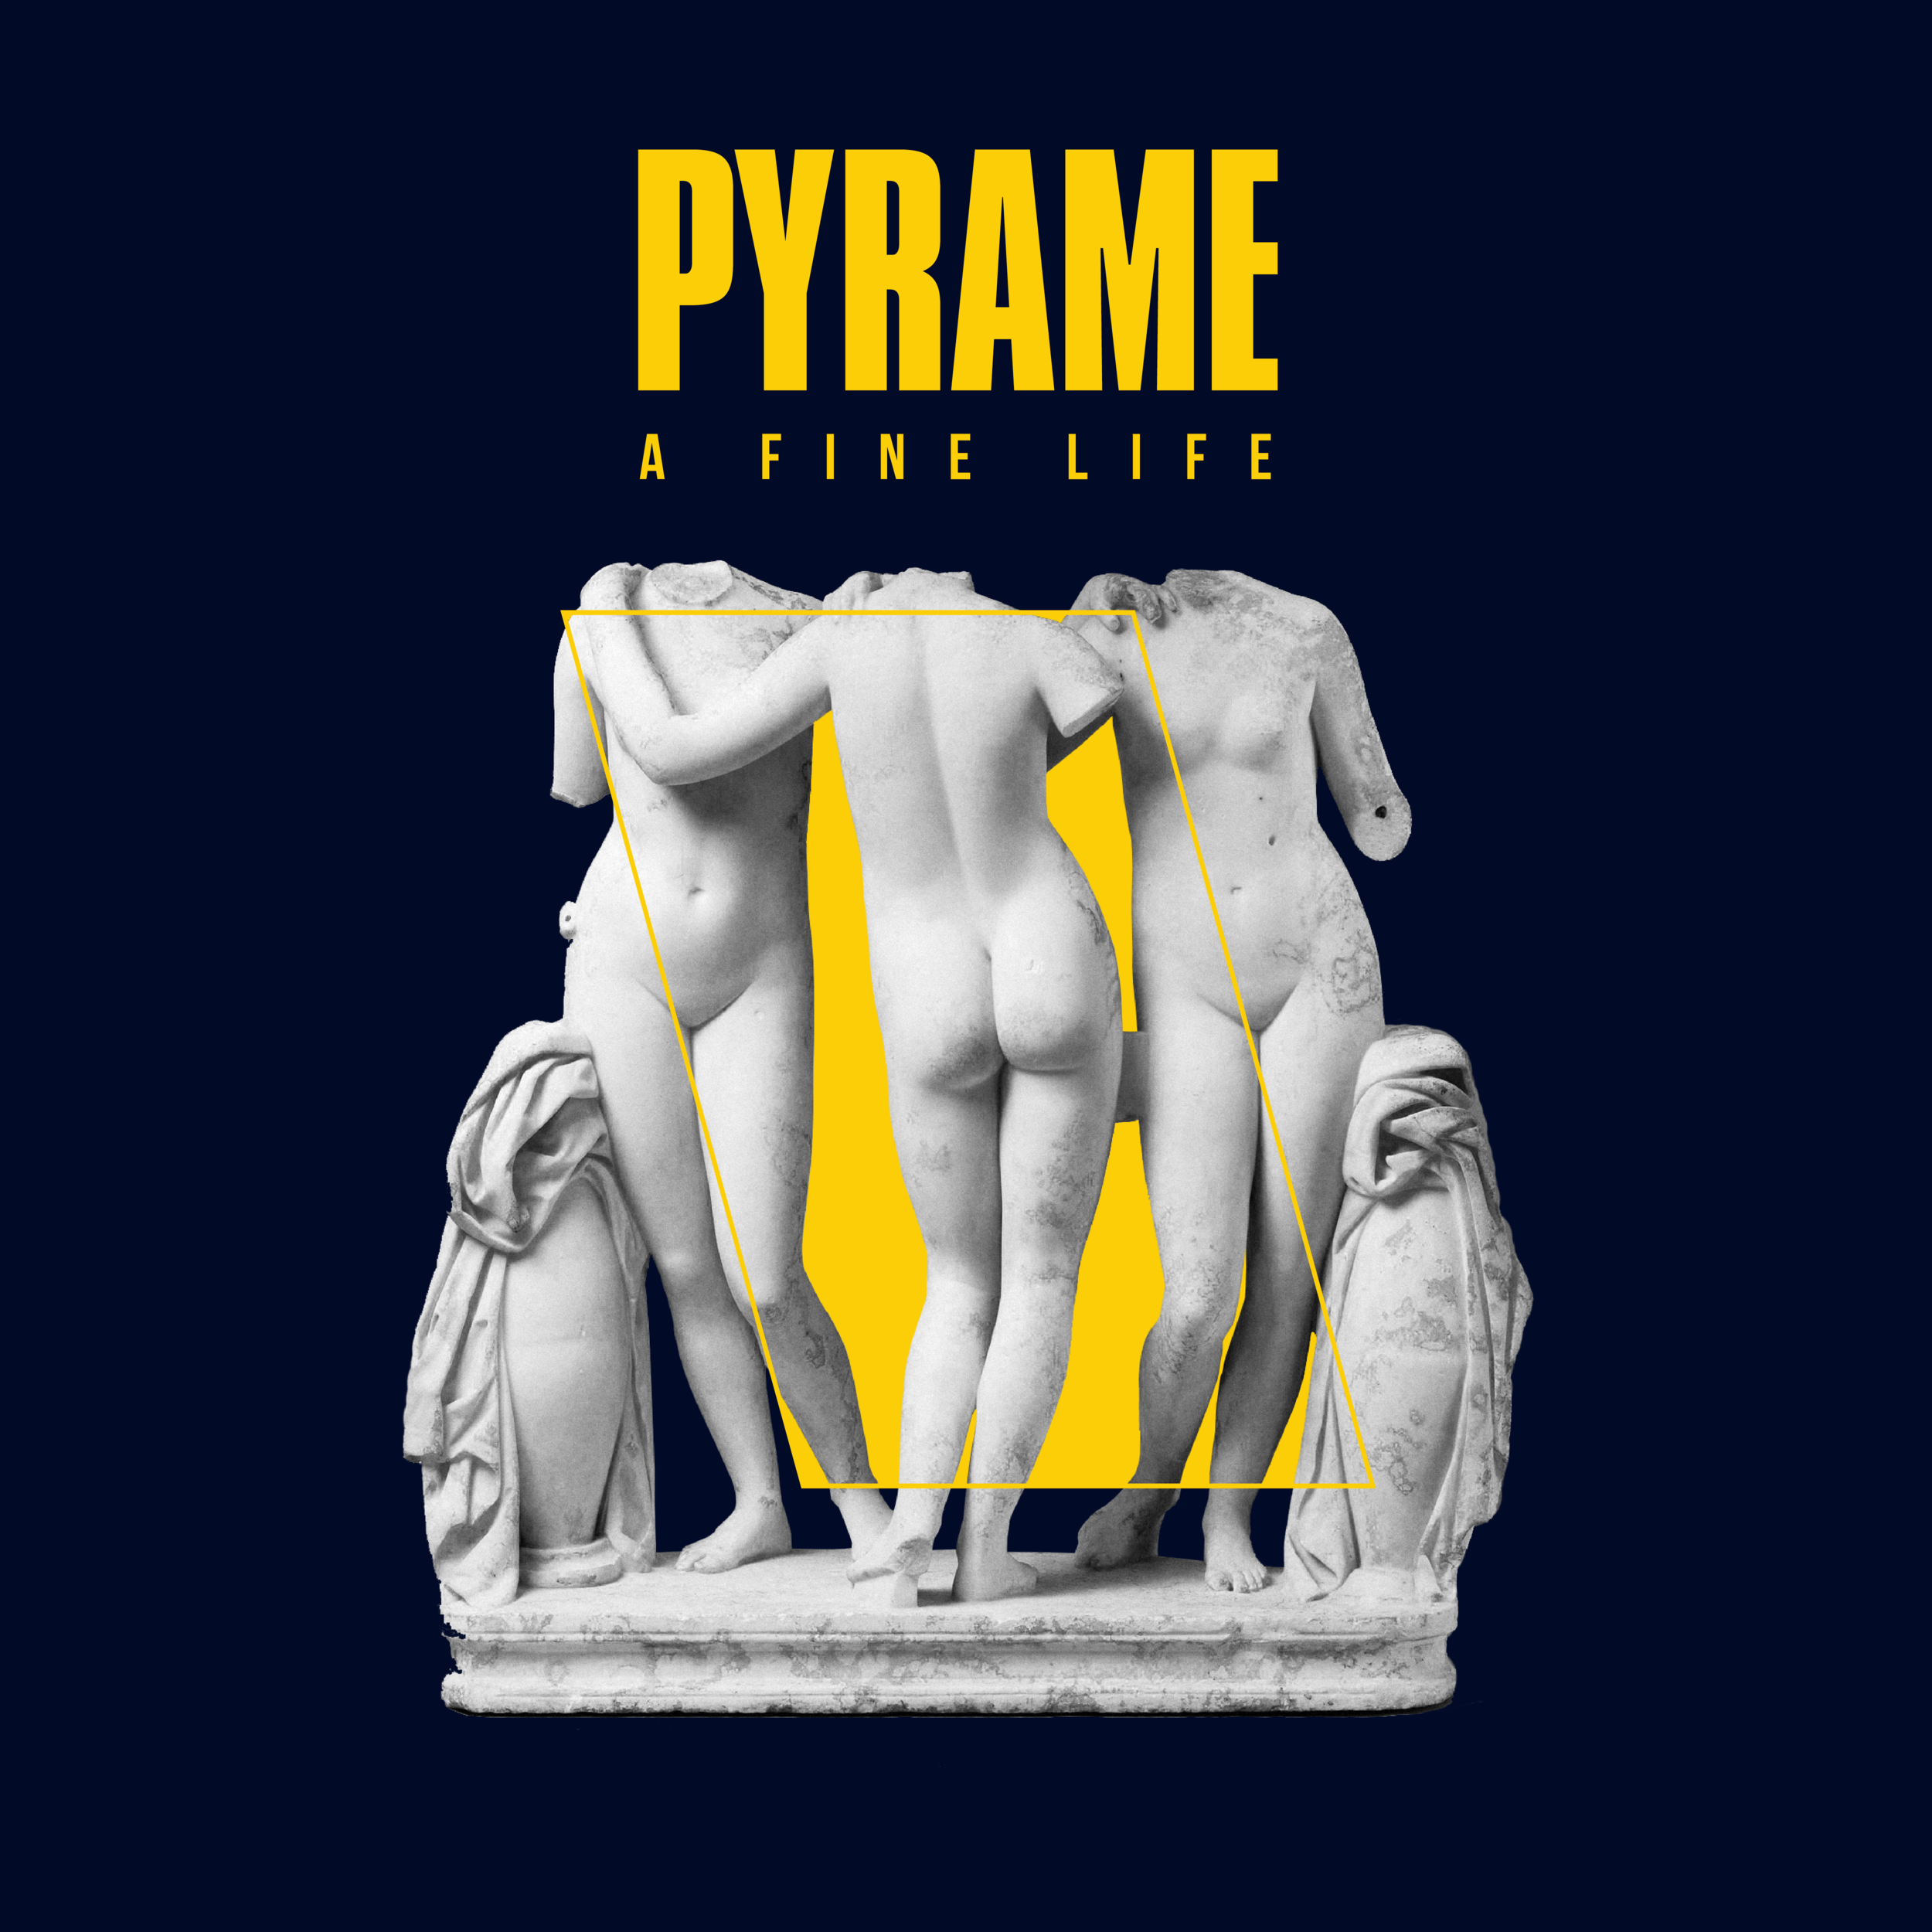 PYRAME A Fine Life EP Artwork - by Christoffer Budtz